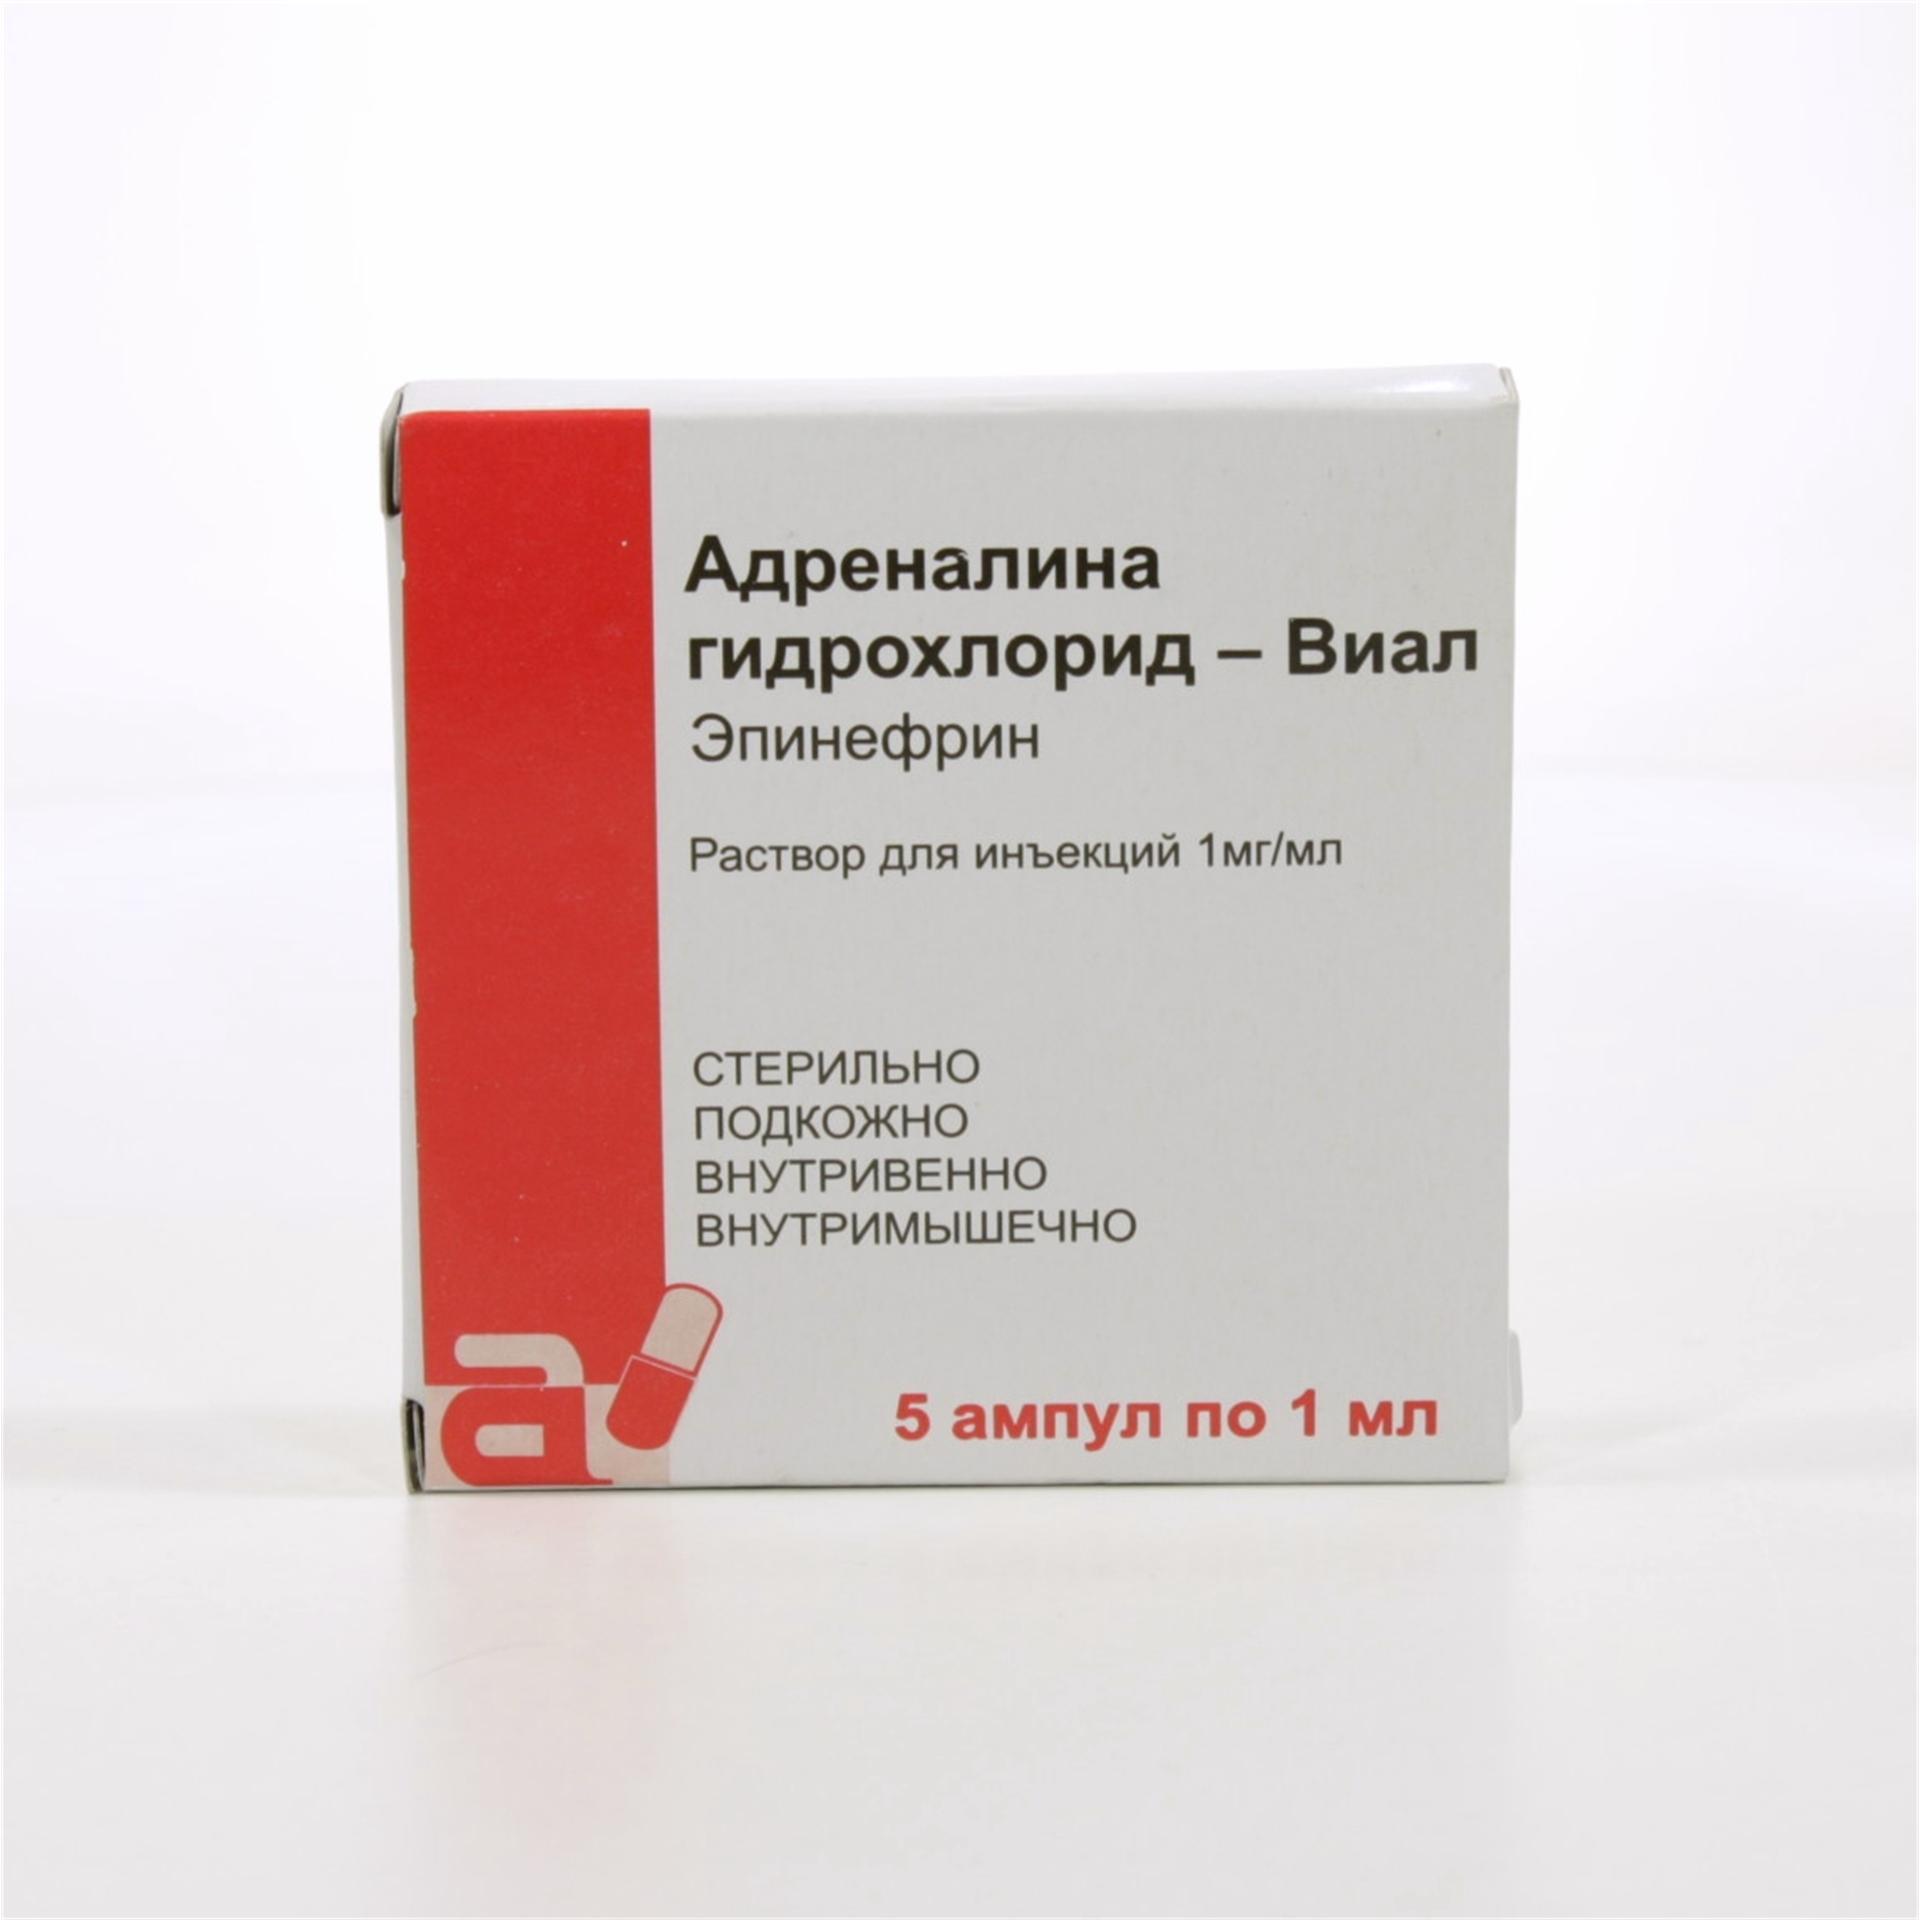 Адреналина гидрохлорид   Adrenalin hydrochloridum